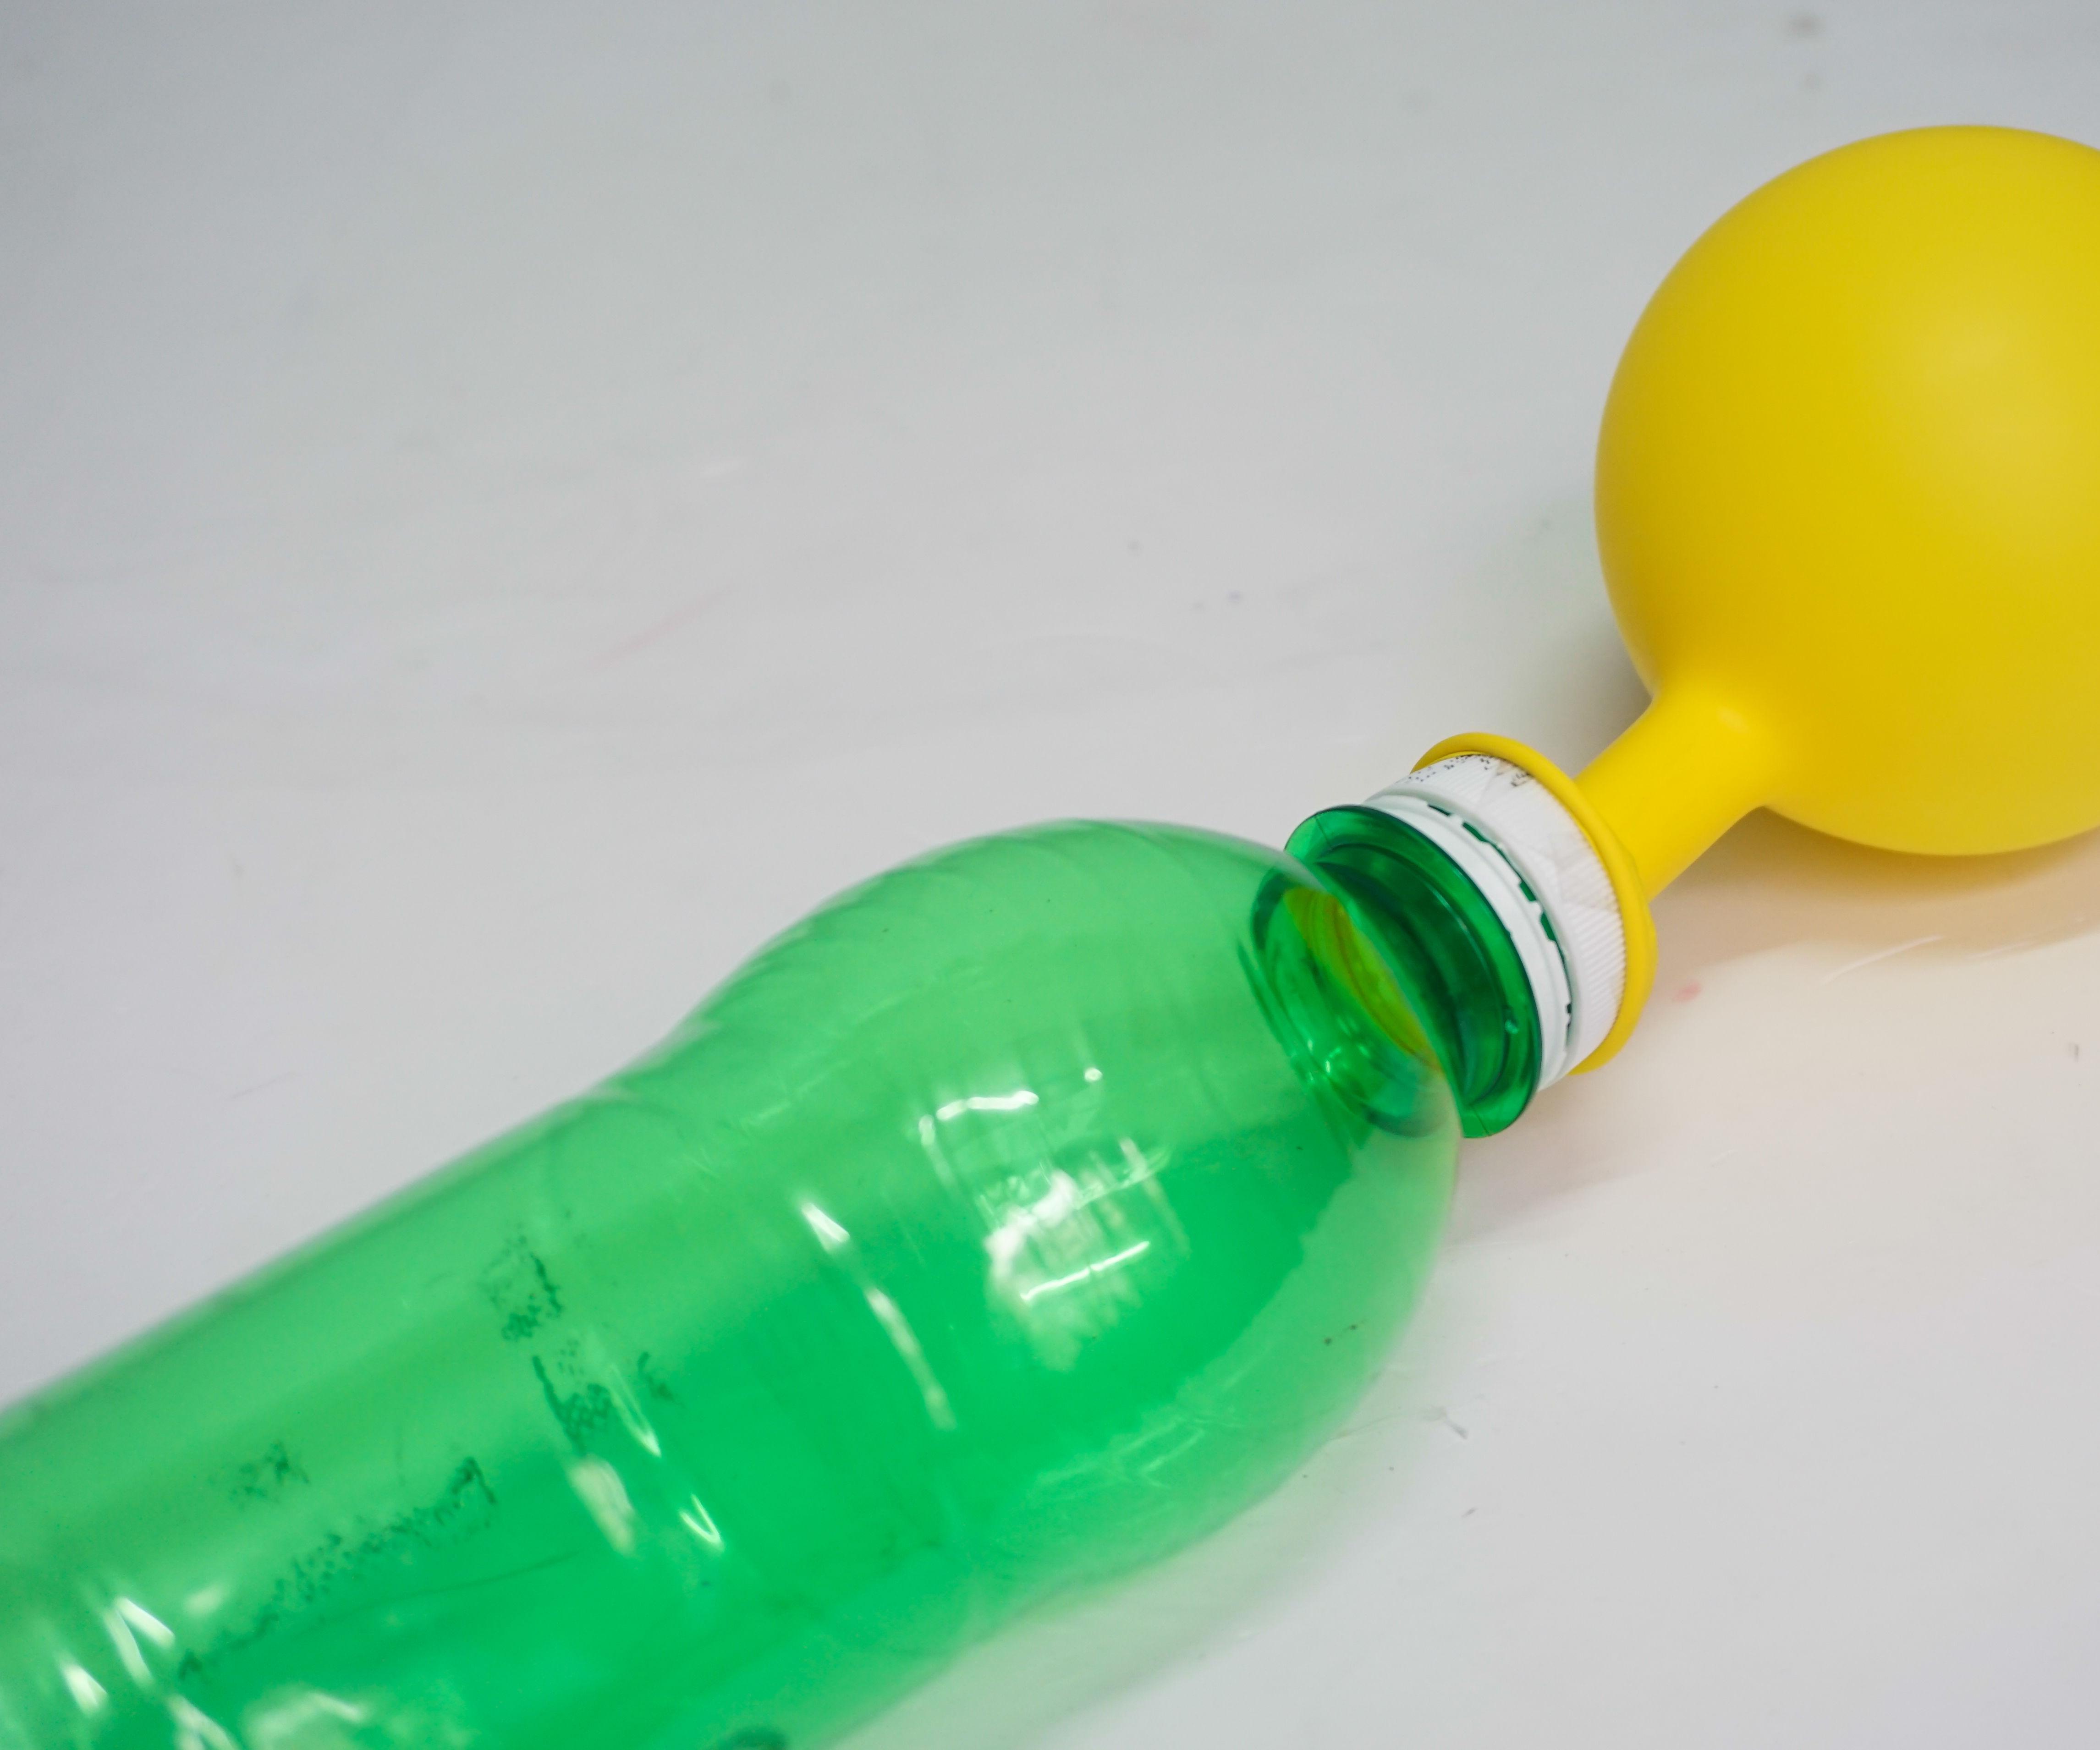 3 Simple Life Hacks for Plastic Bottle